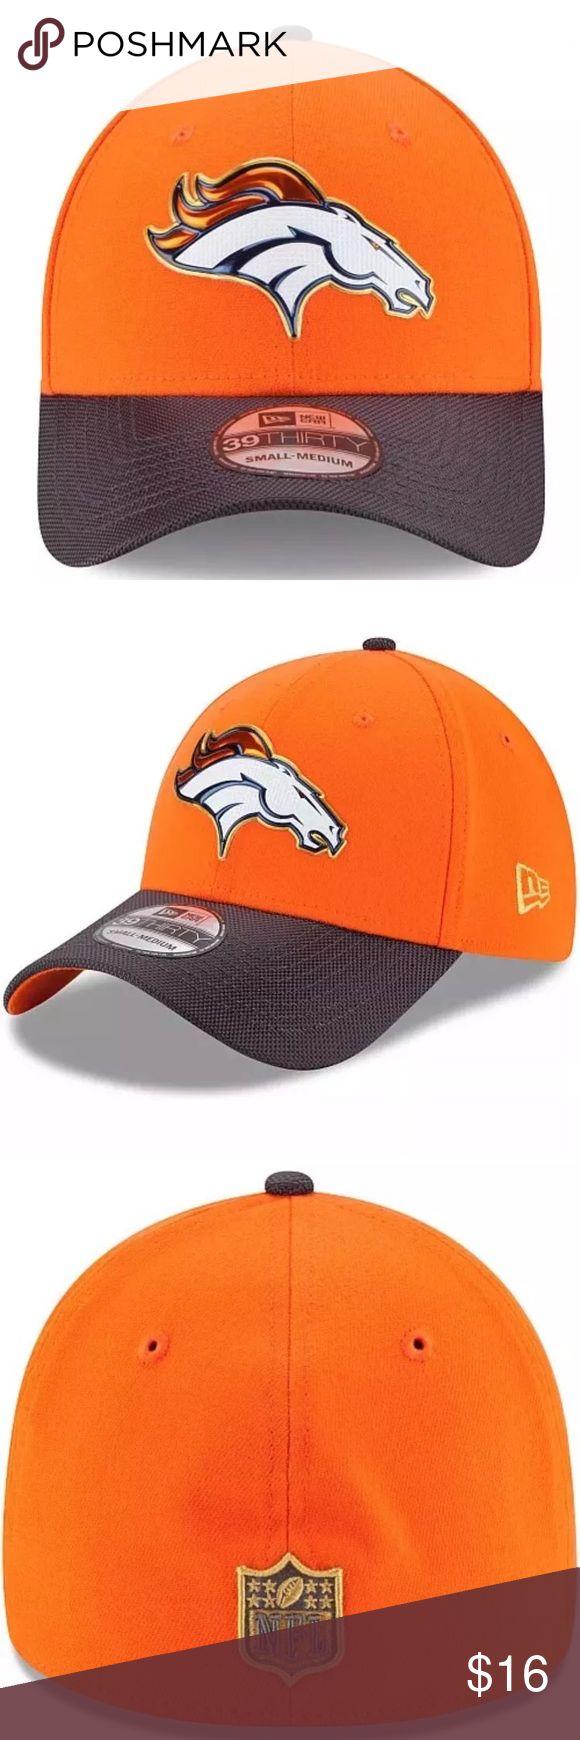 NewEra 39Thirty Gold Collection Denver Broncos Hat Denver Broncos New Era NFL Gold Collection On Field 39Thirty Flex Hat L/XL  Brand : New Era  Style : 39Thirty   Size : L/XL  Team : Denver Broncos  Brand new with tags New Era Accessories Hats